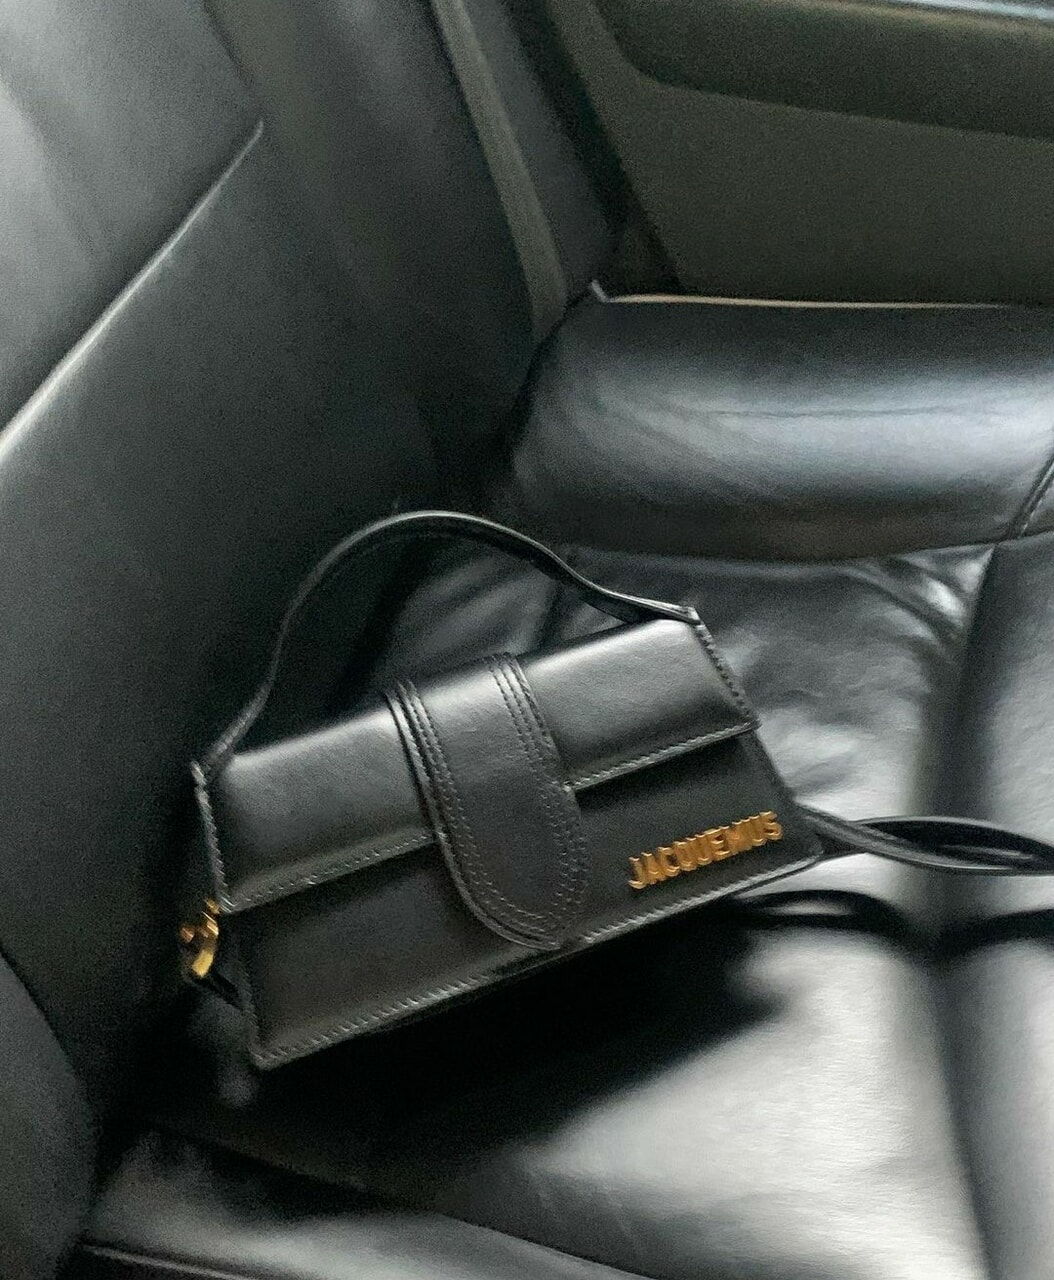 backseat, bags, and beautiful image